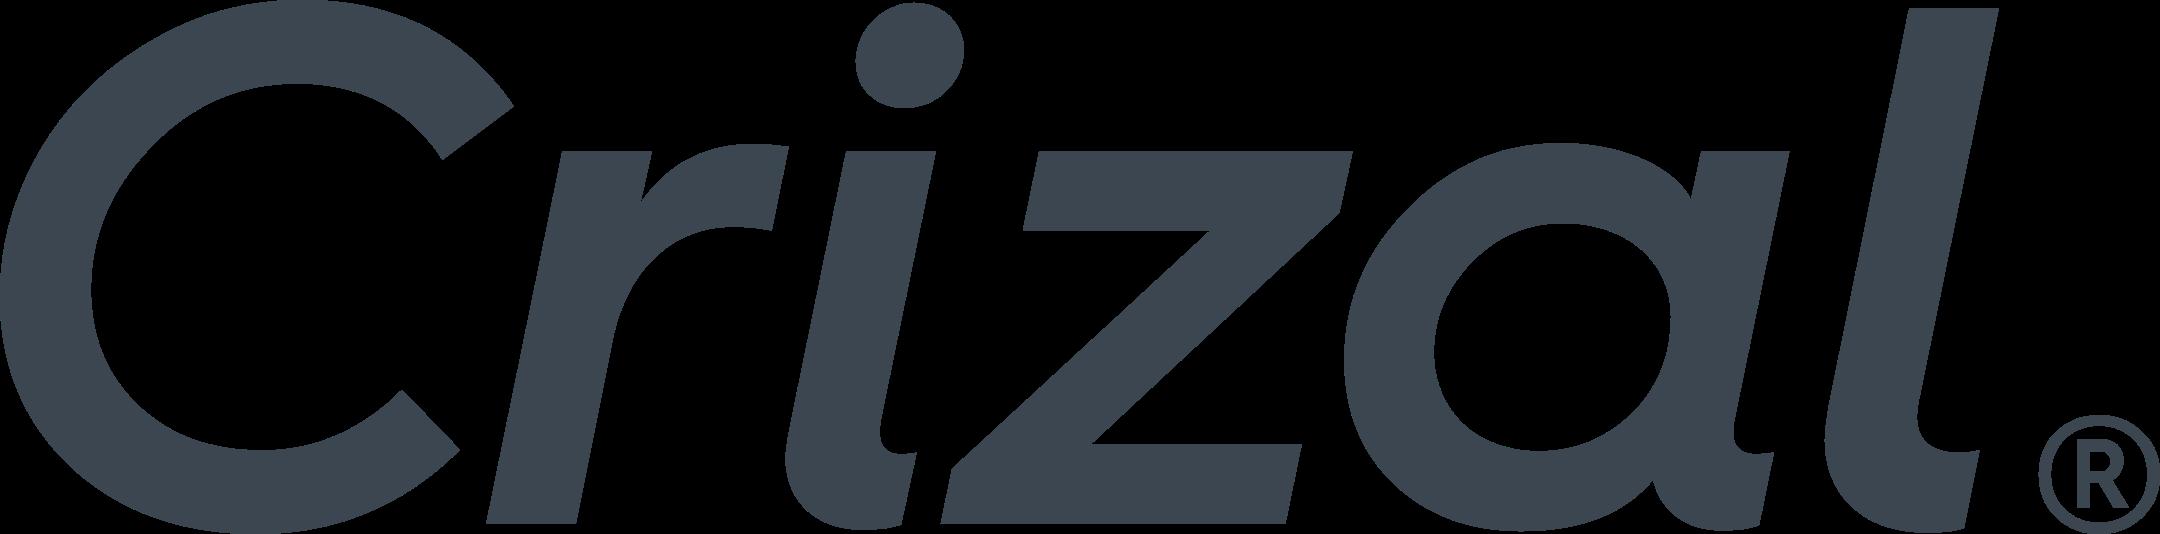 crizal logo 1 - Crizal Logo